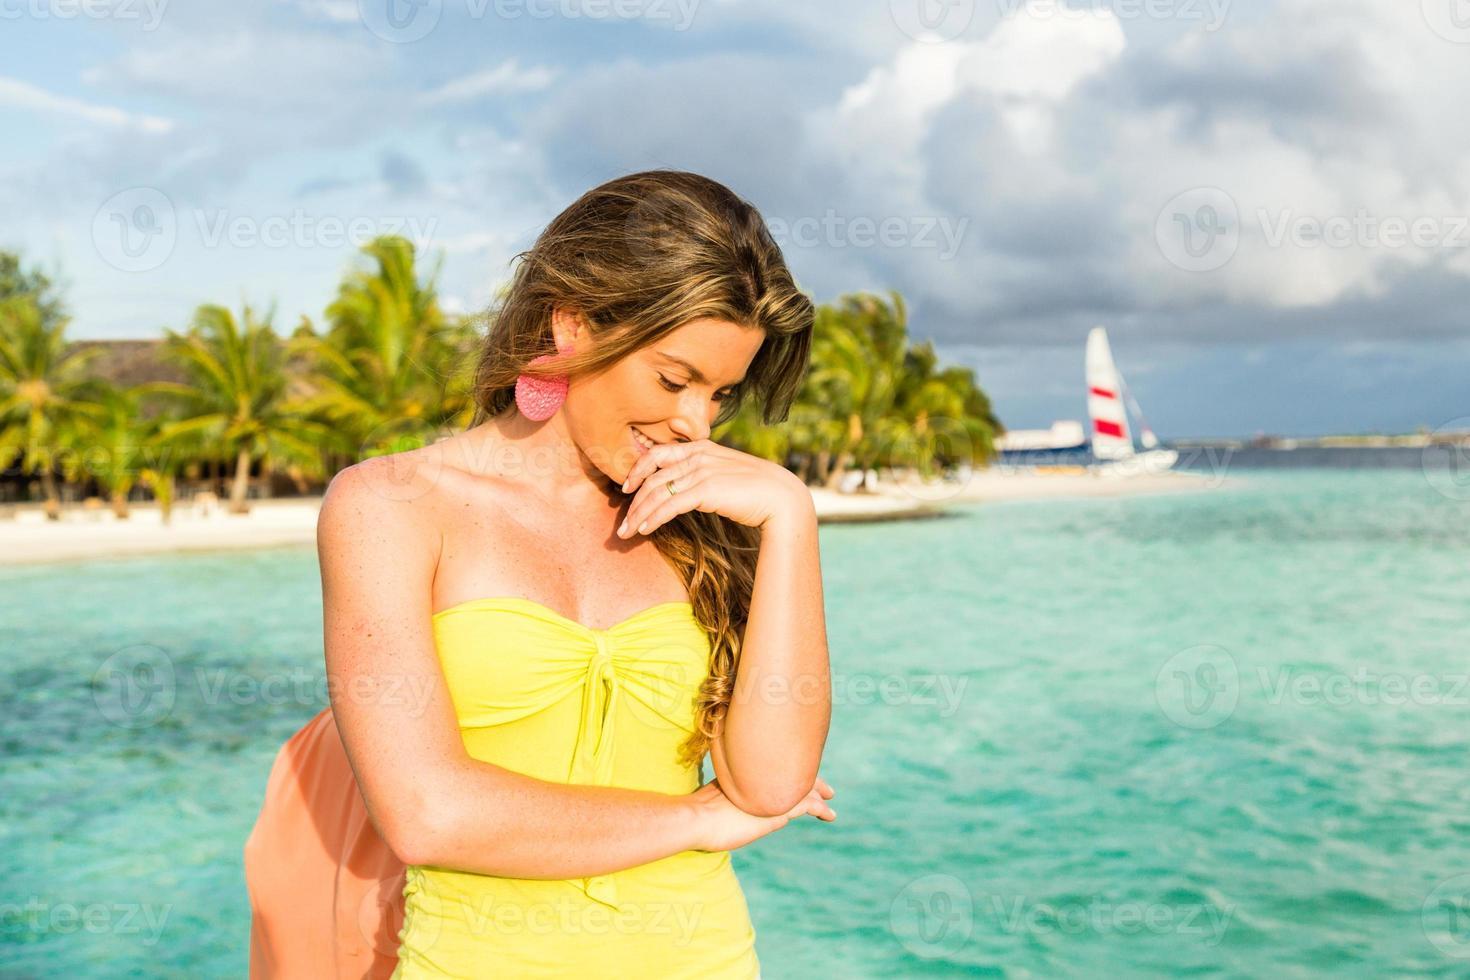 mulheres nas ilhas maldivas foto